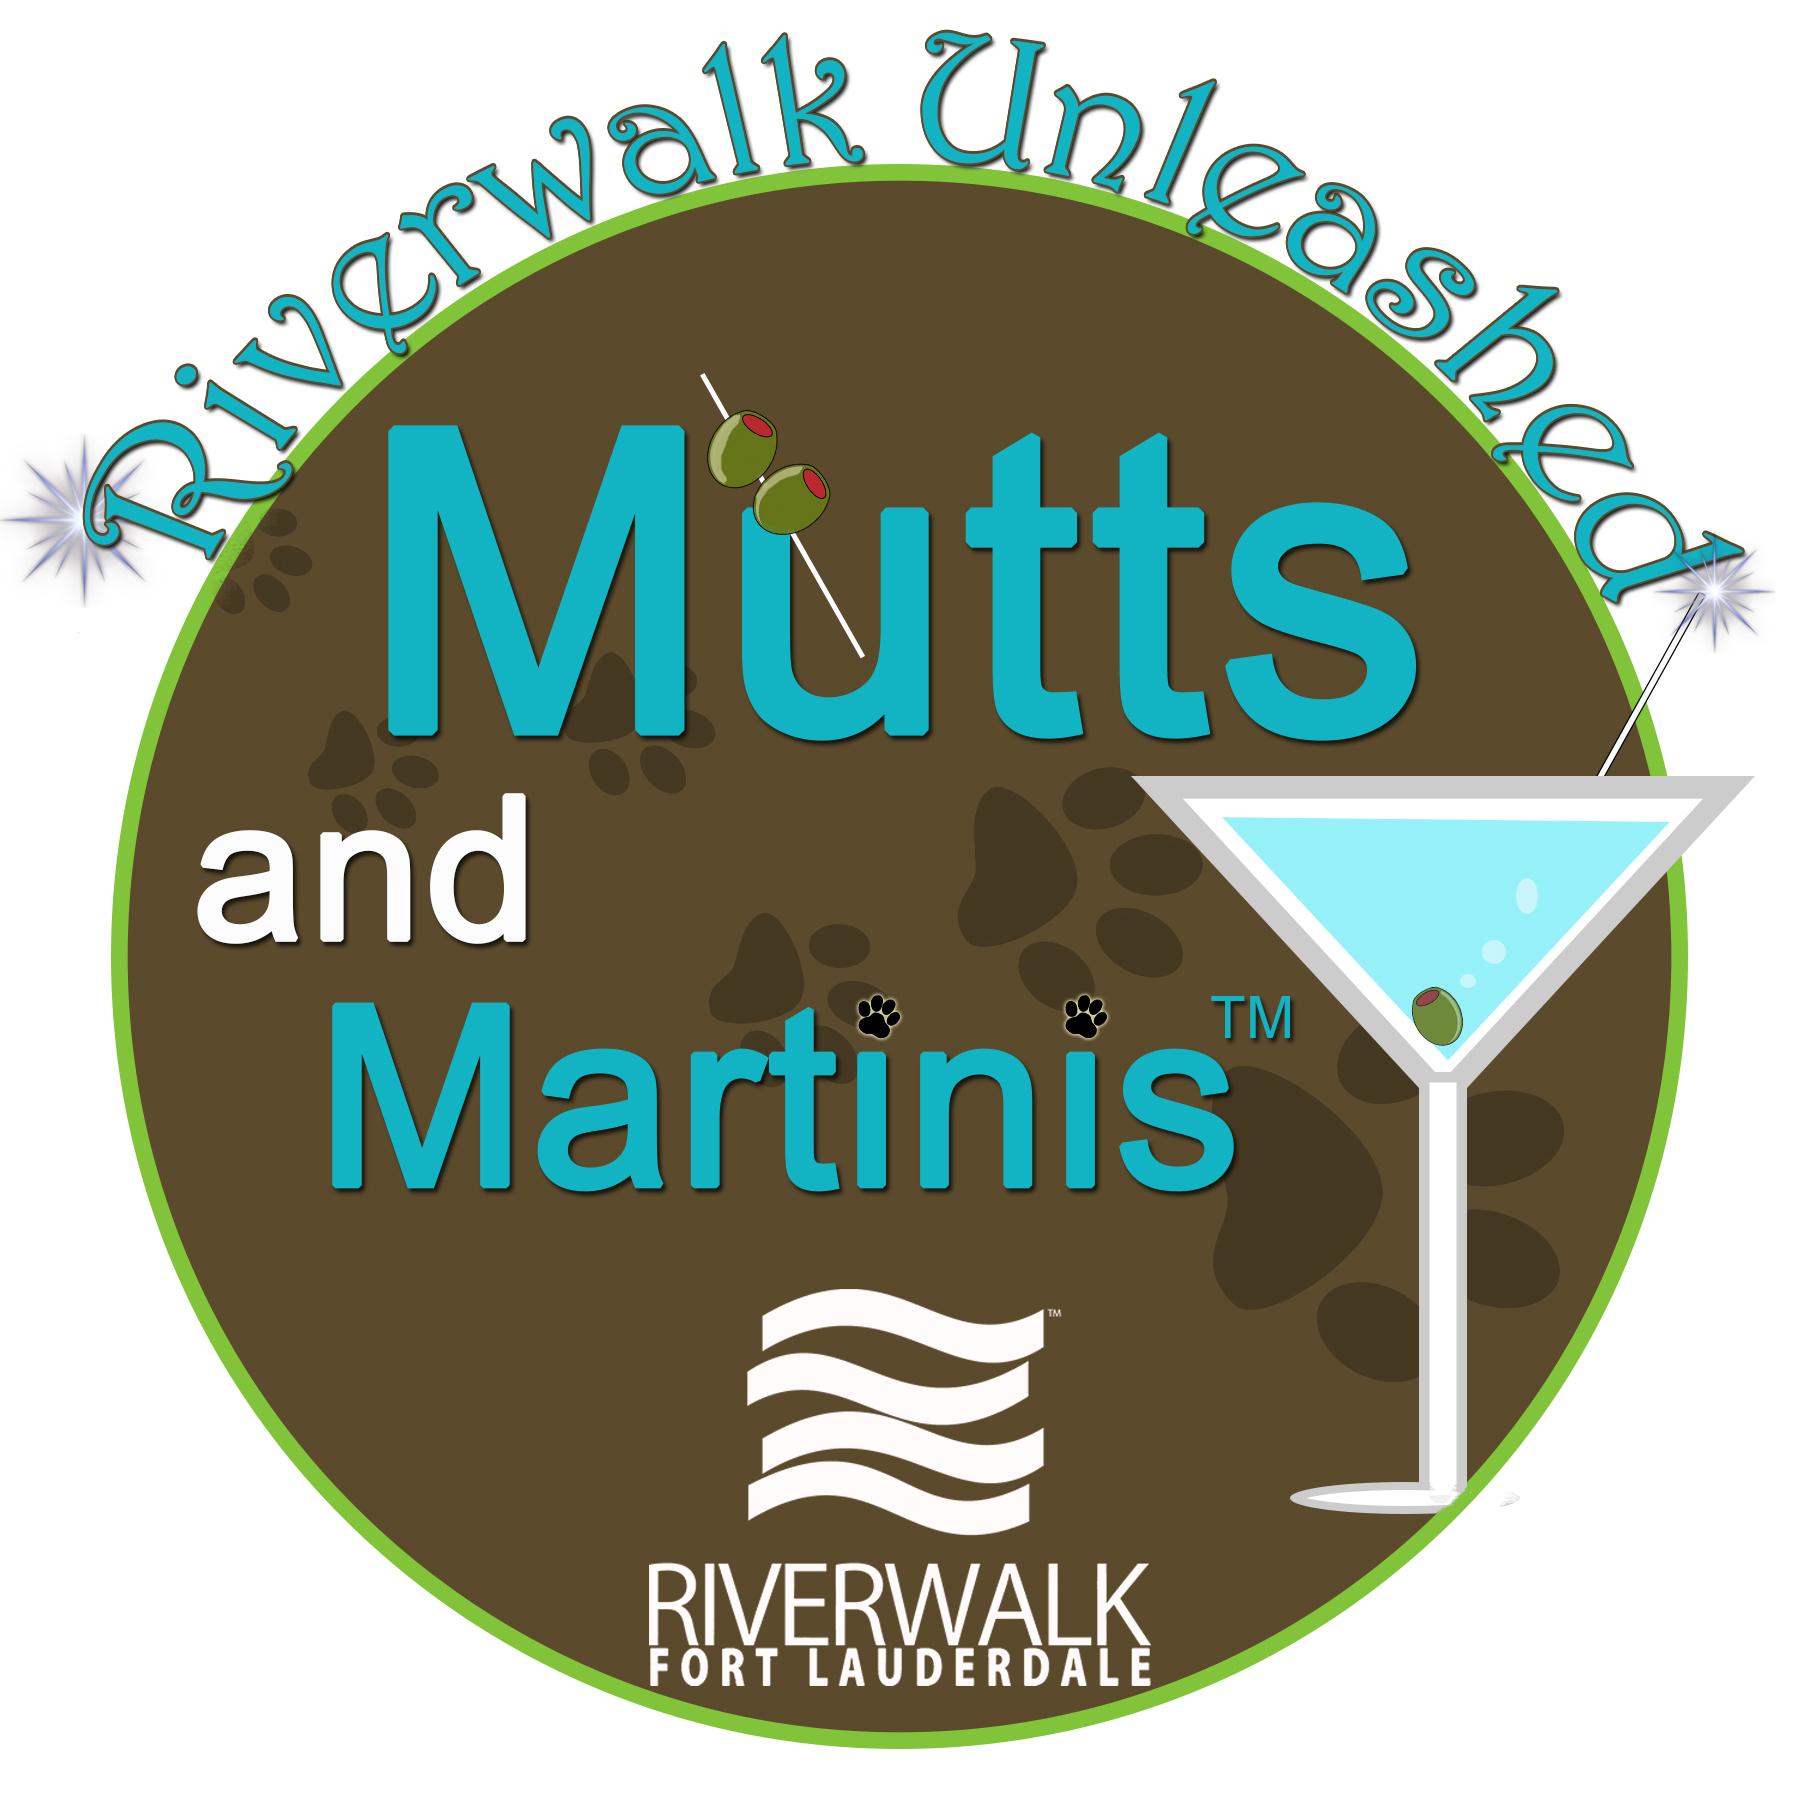 Riverwalk Fort Lauderdale – INFORMATION ◇ EVENTS ◇ ADVOCACY